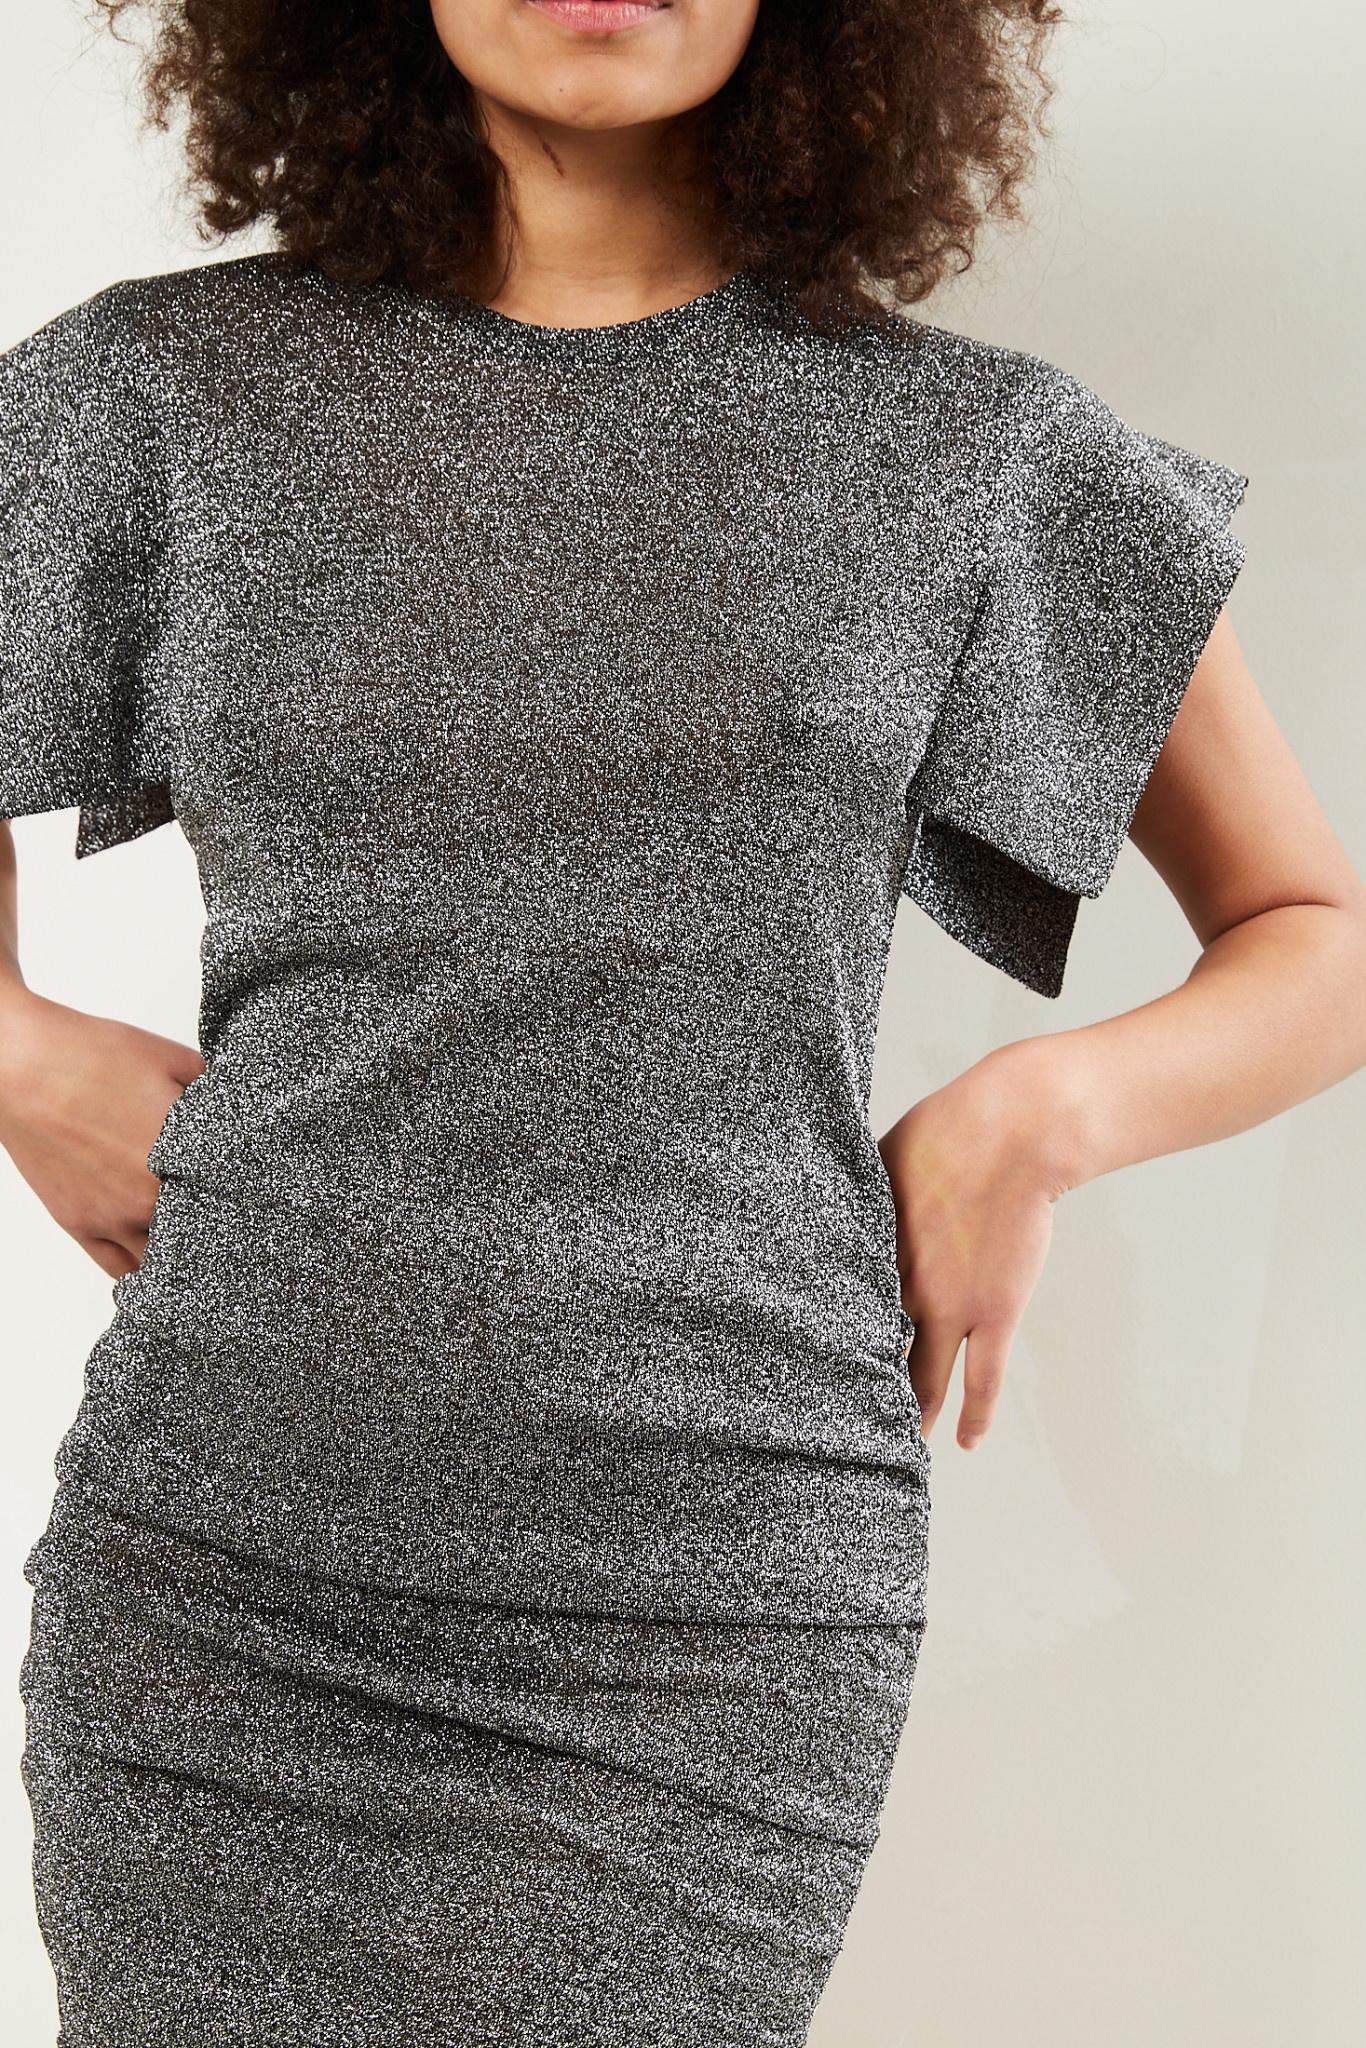 Isabel Marant - Marthe fluid lurex dress